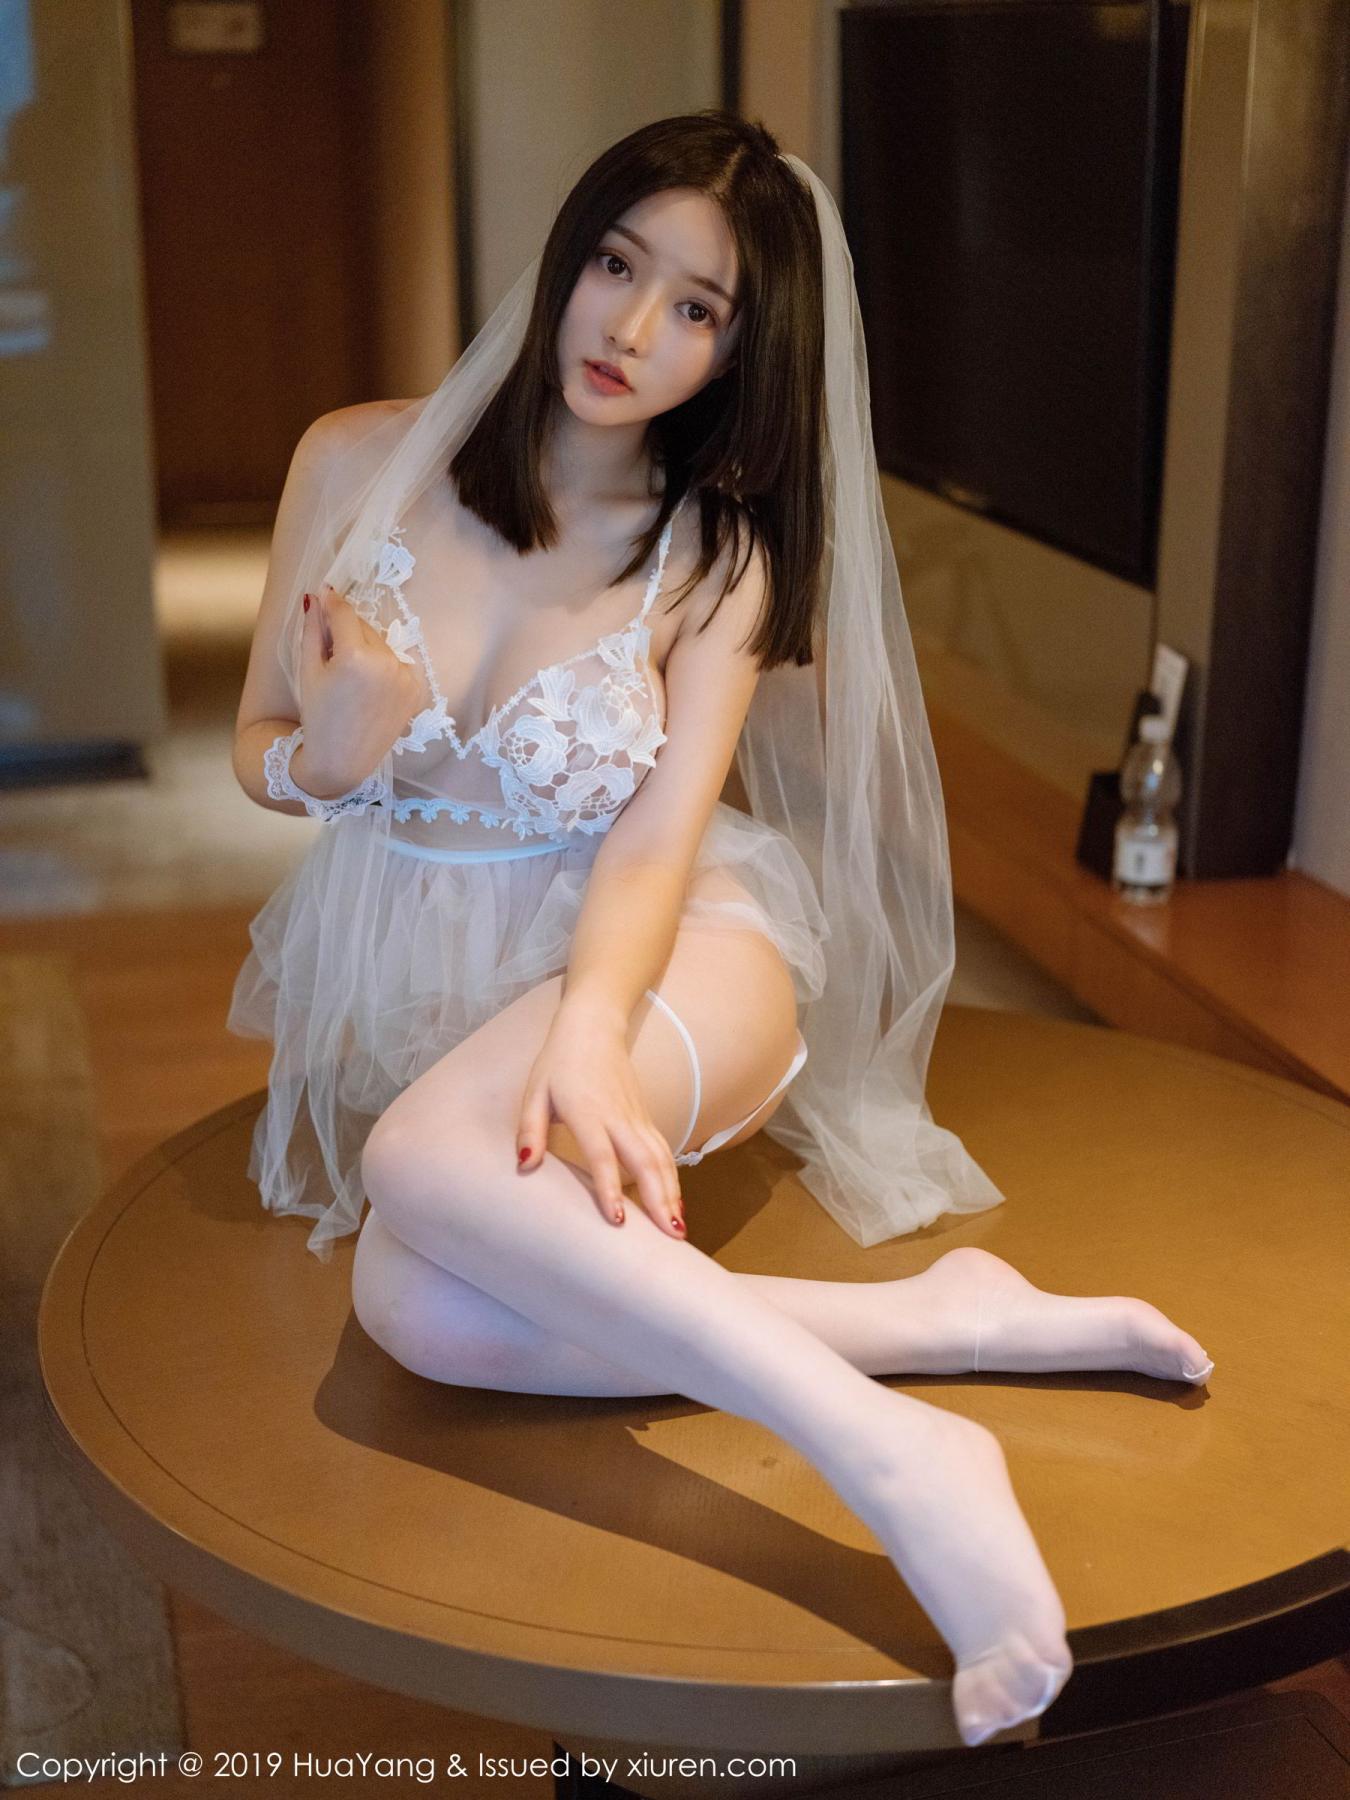 [Huayang] Vol.122 Bride Tang Wan Er 29P, HuaYang, Tang Wan Er, Underwear